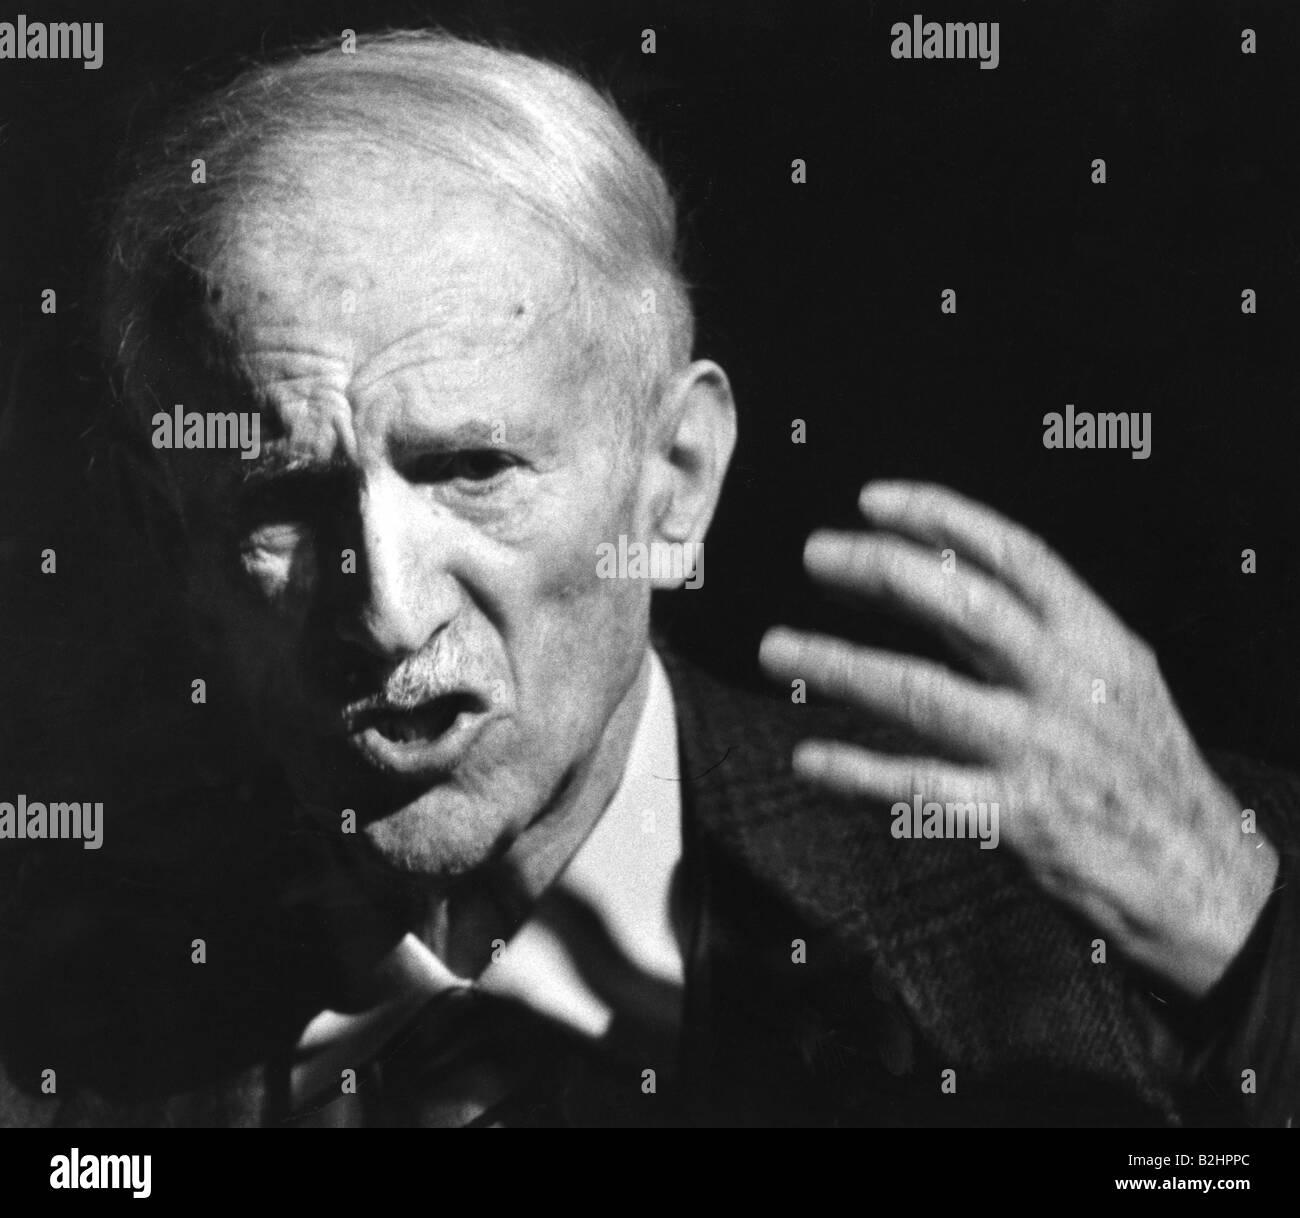 Kempner, Robert, 17.10.1899 - 15.8.1993, American attorney, German origin, portrait, 1985, , Additional-Rights-Clearances - Stock Image